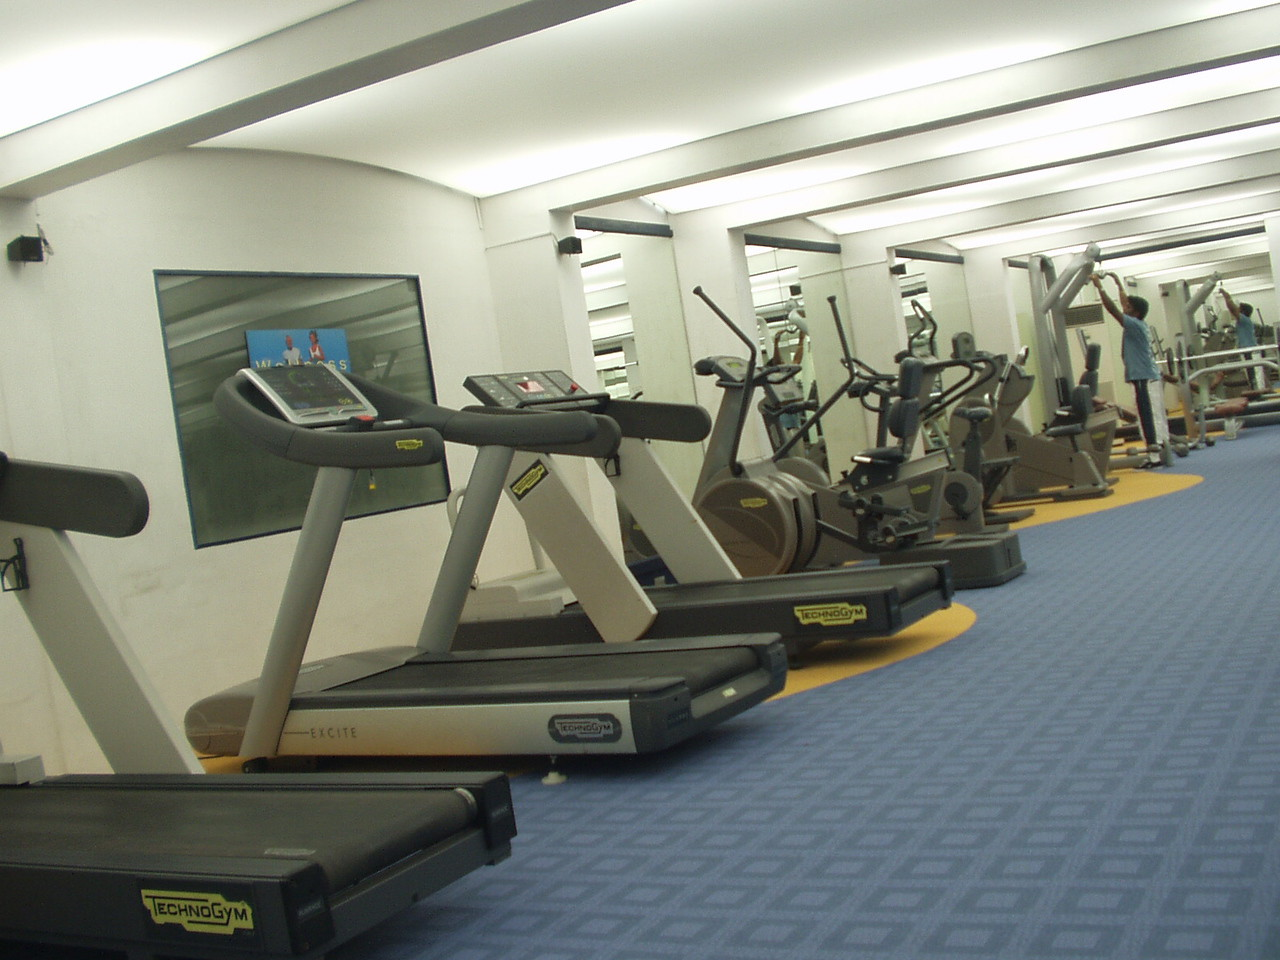 8 November: Gym